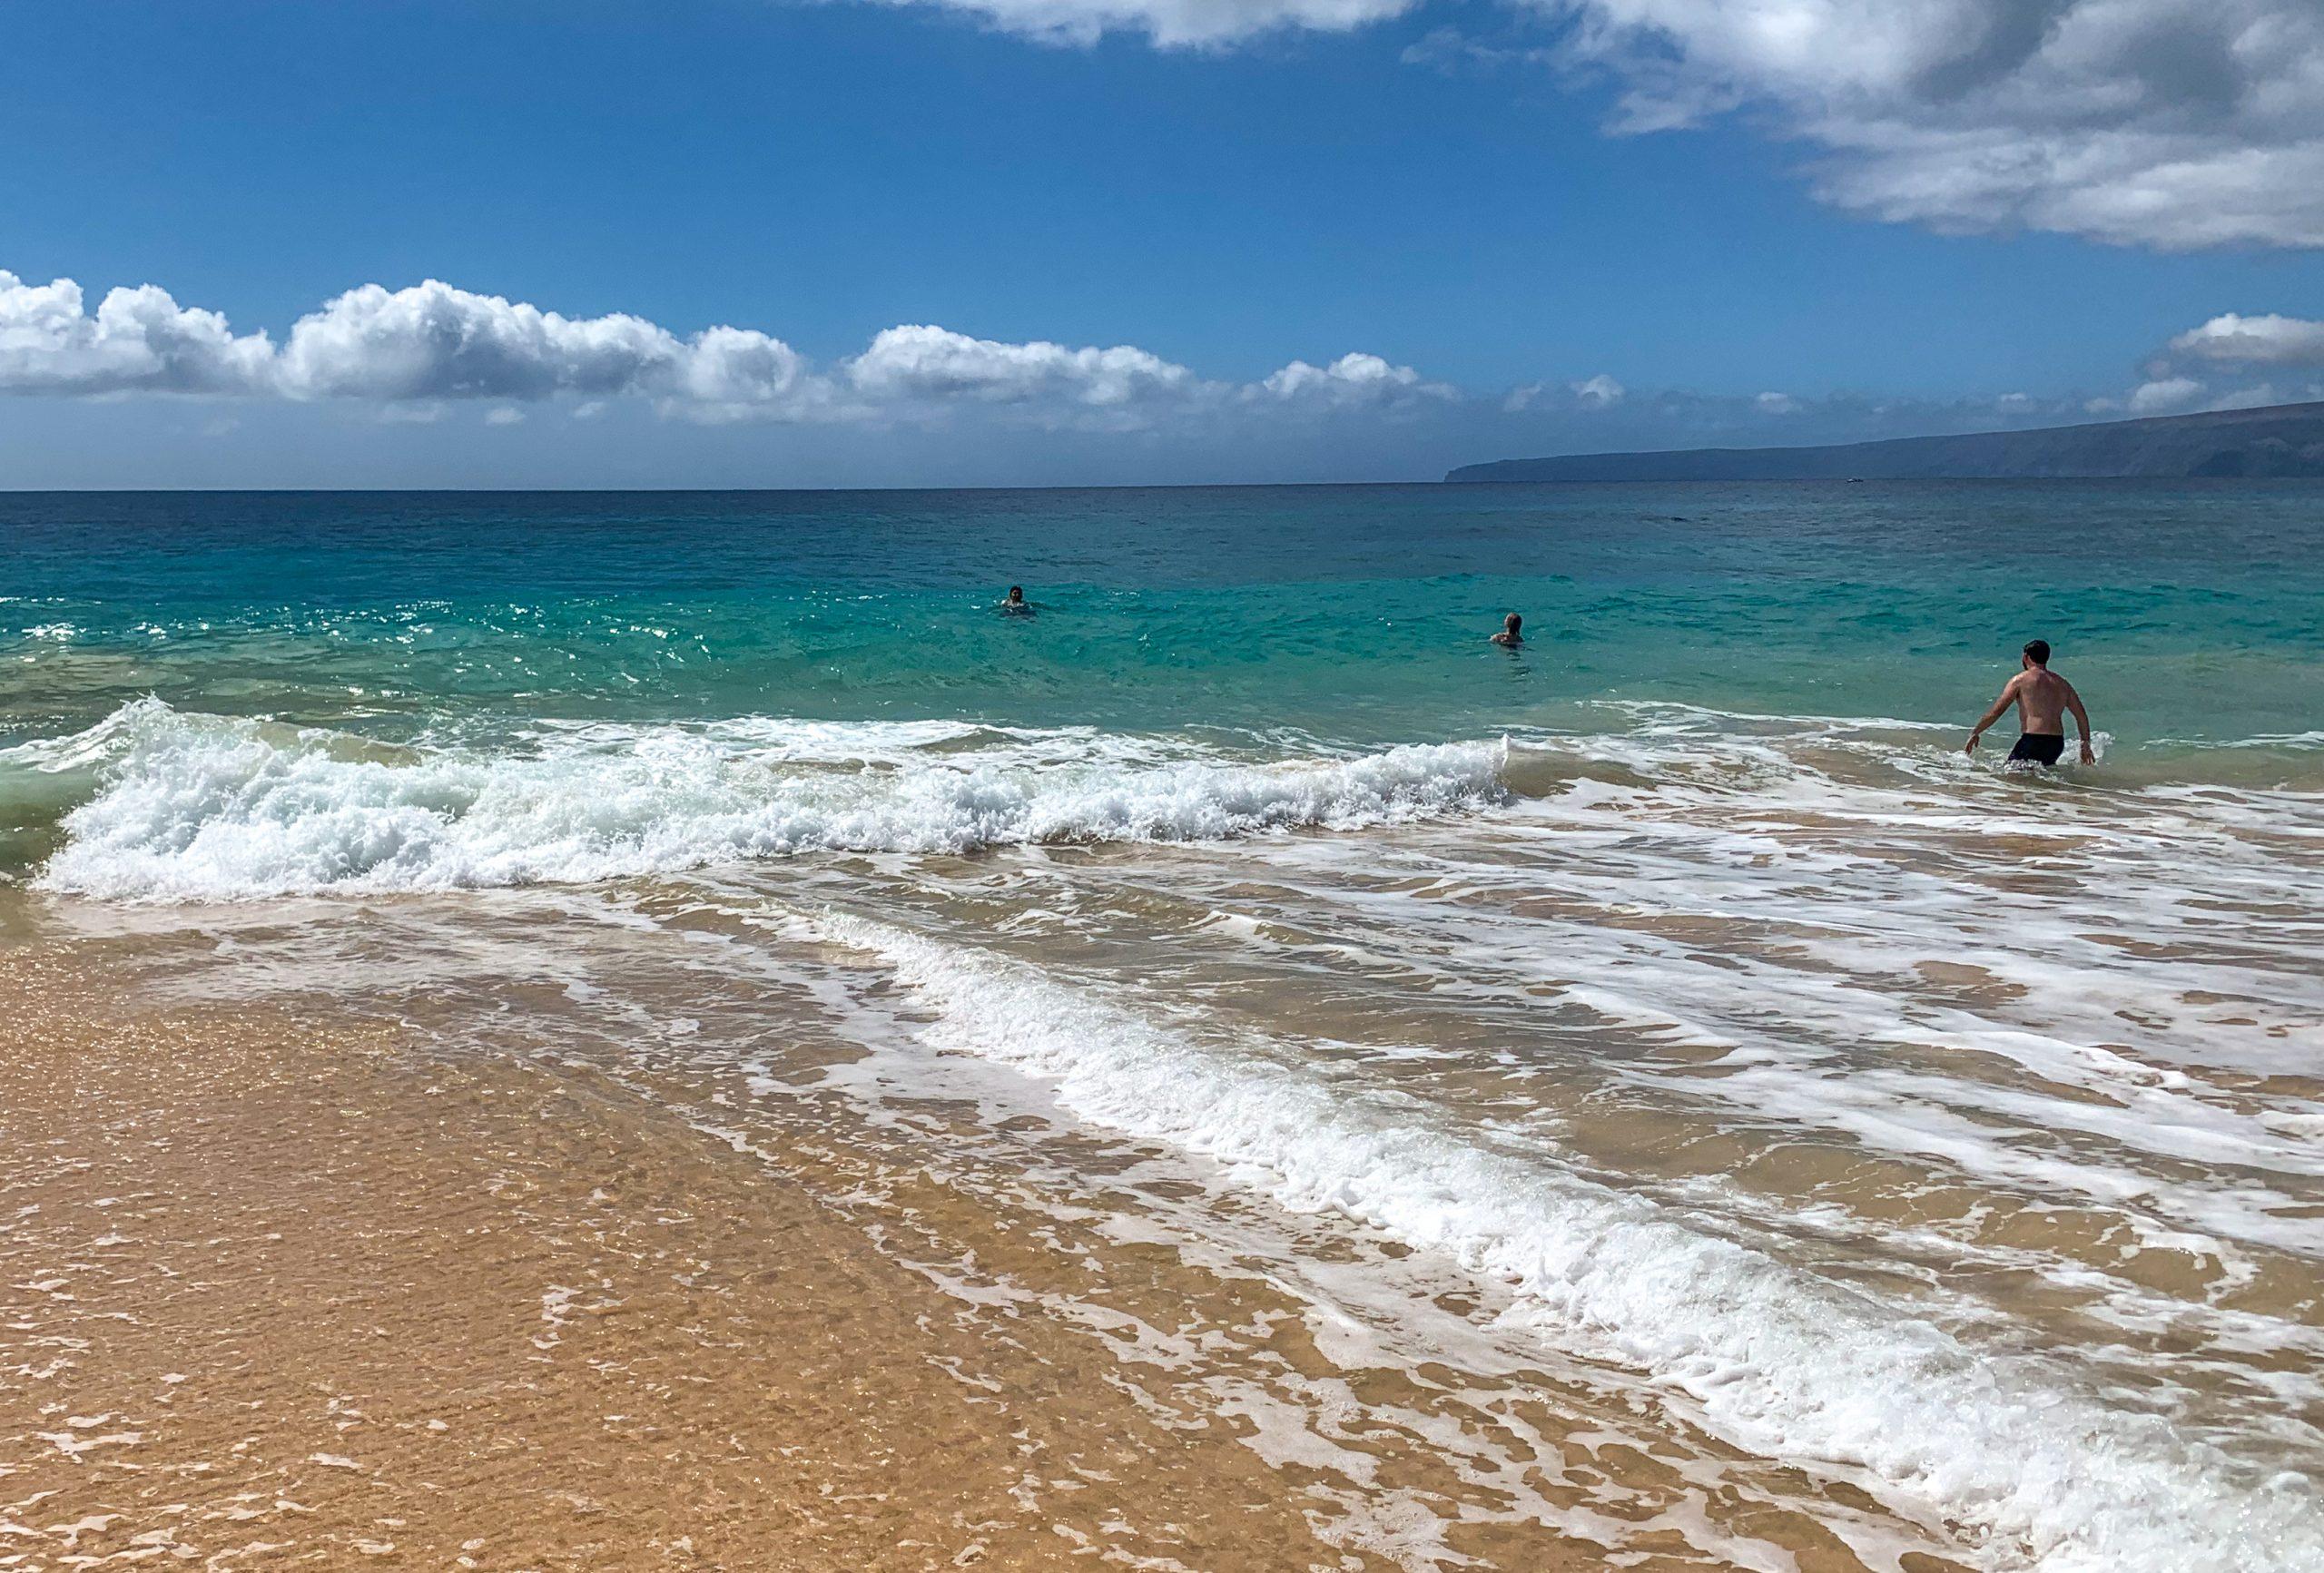 Beach Safety Week Runs Aug. 22-28 in Hawaiʻi